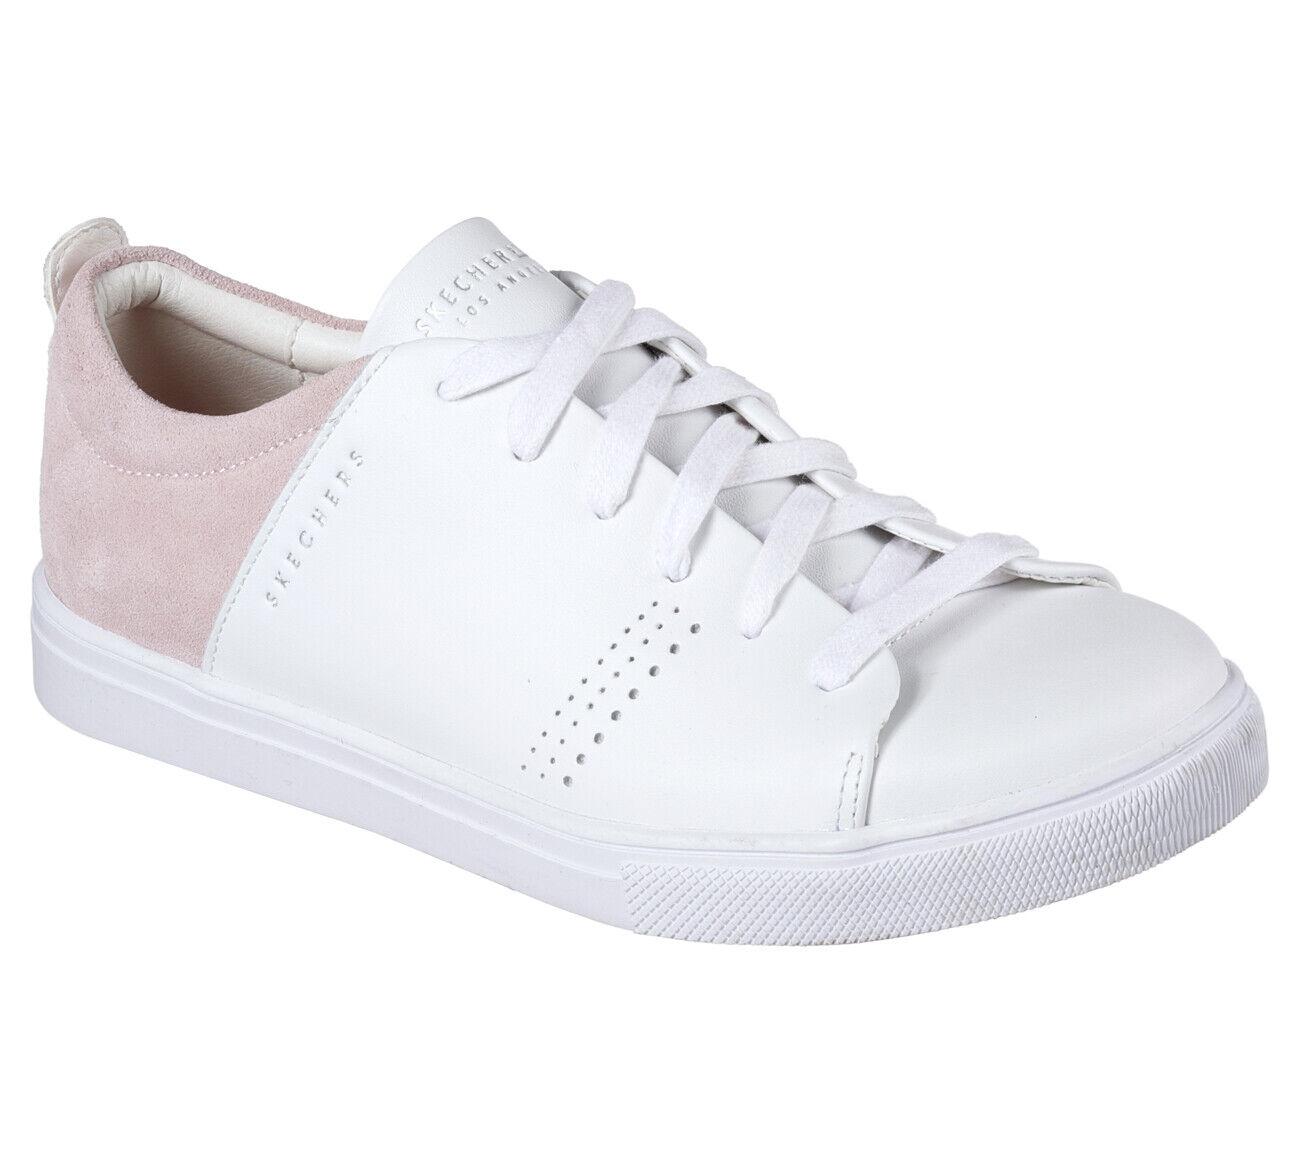 Details zu NEU SKECHERS Damen Sneakers MODA CLEAN STREET Freizeitschuhe Weiß